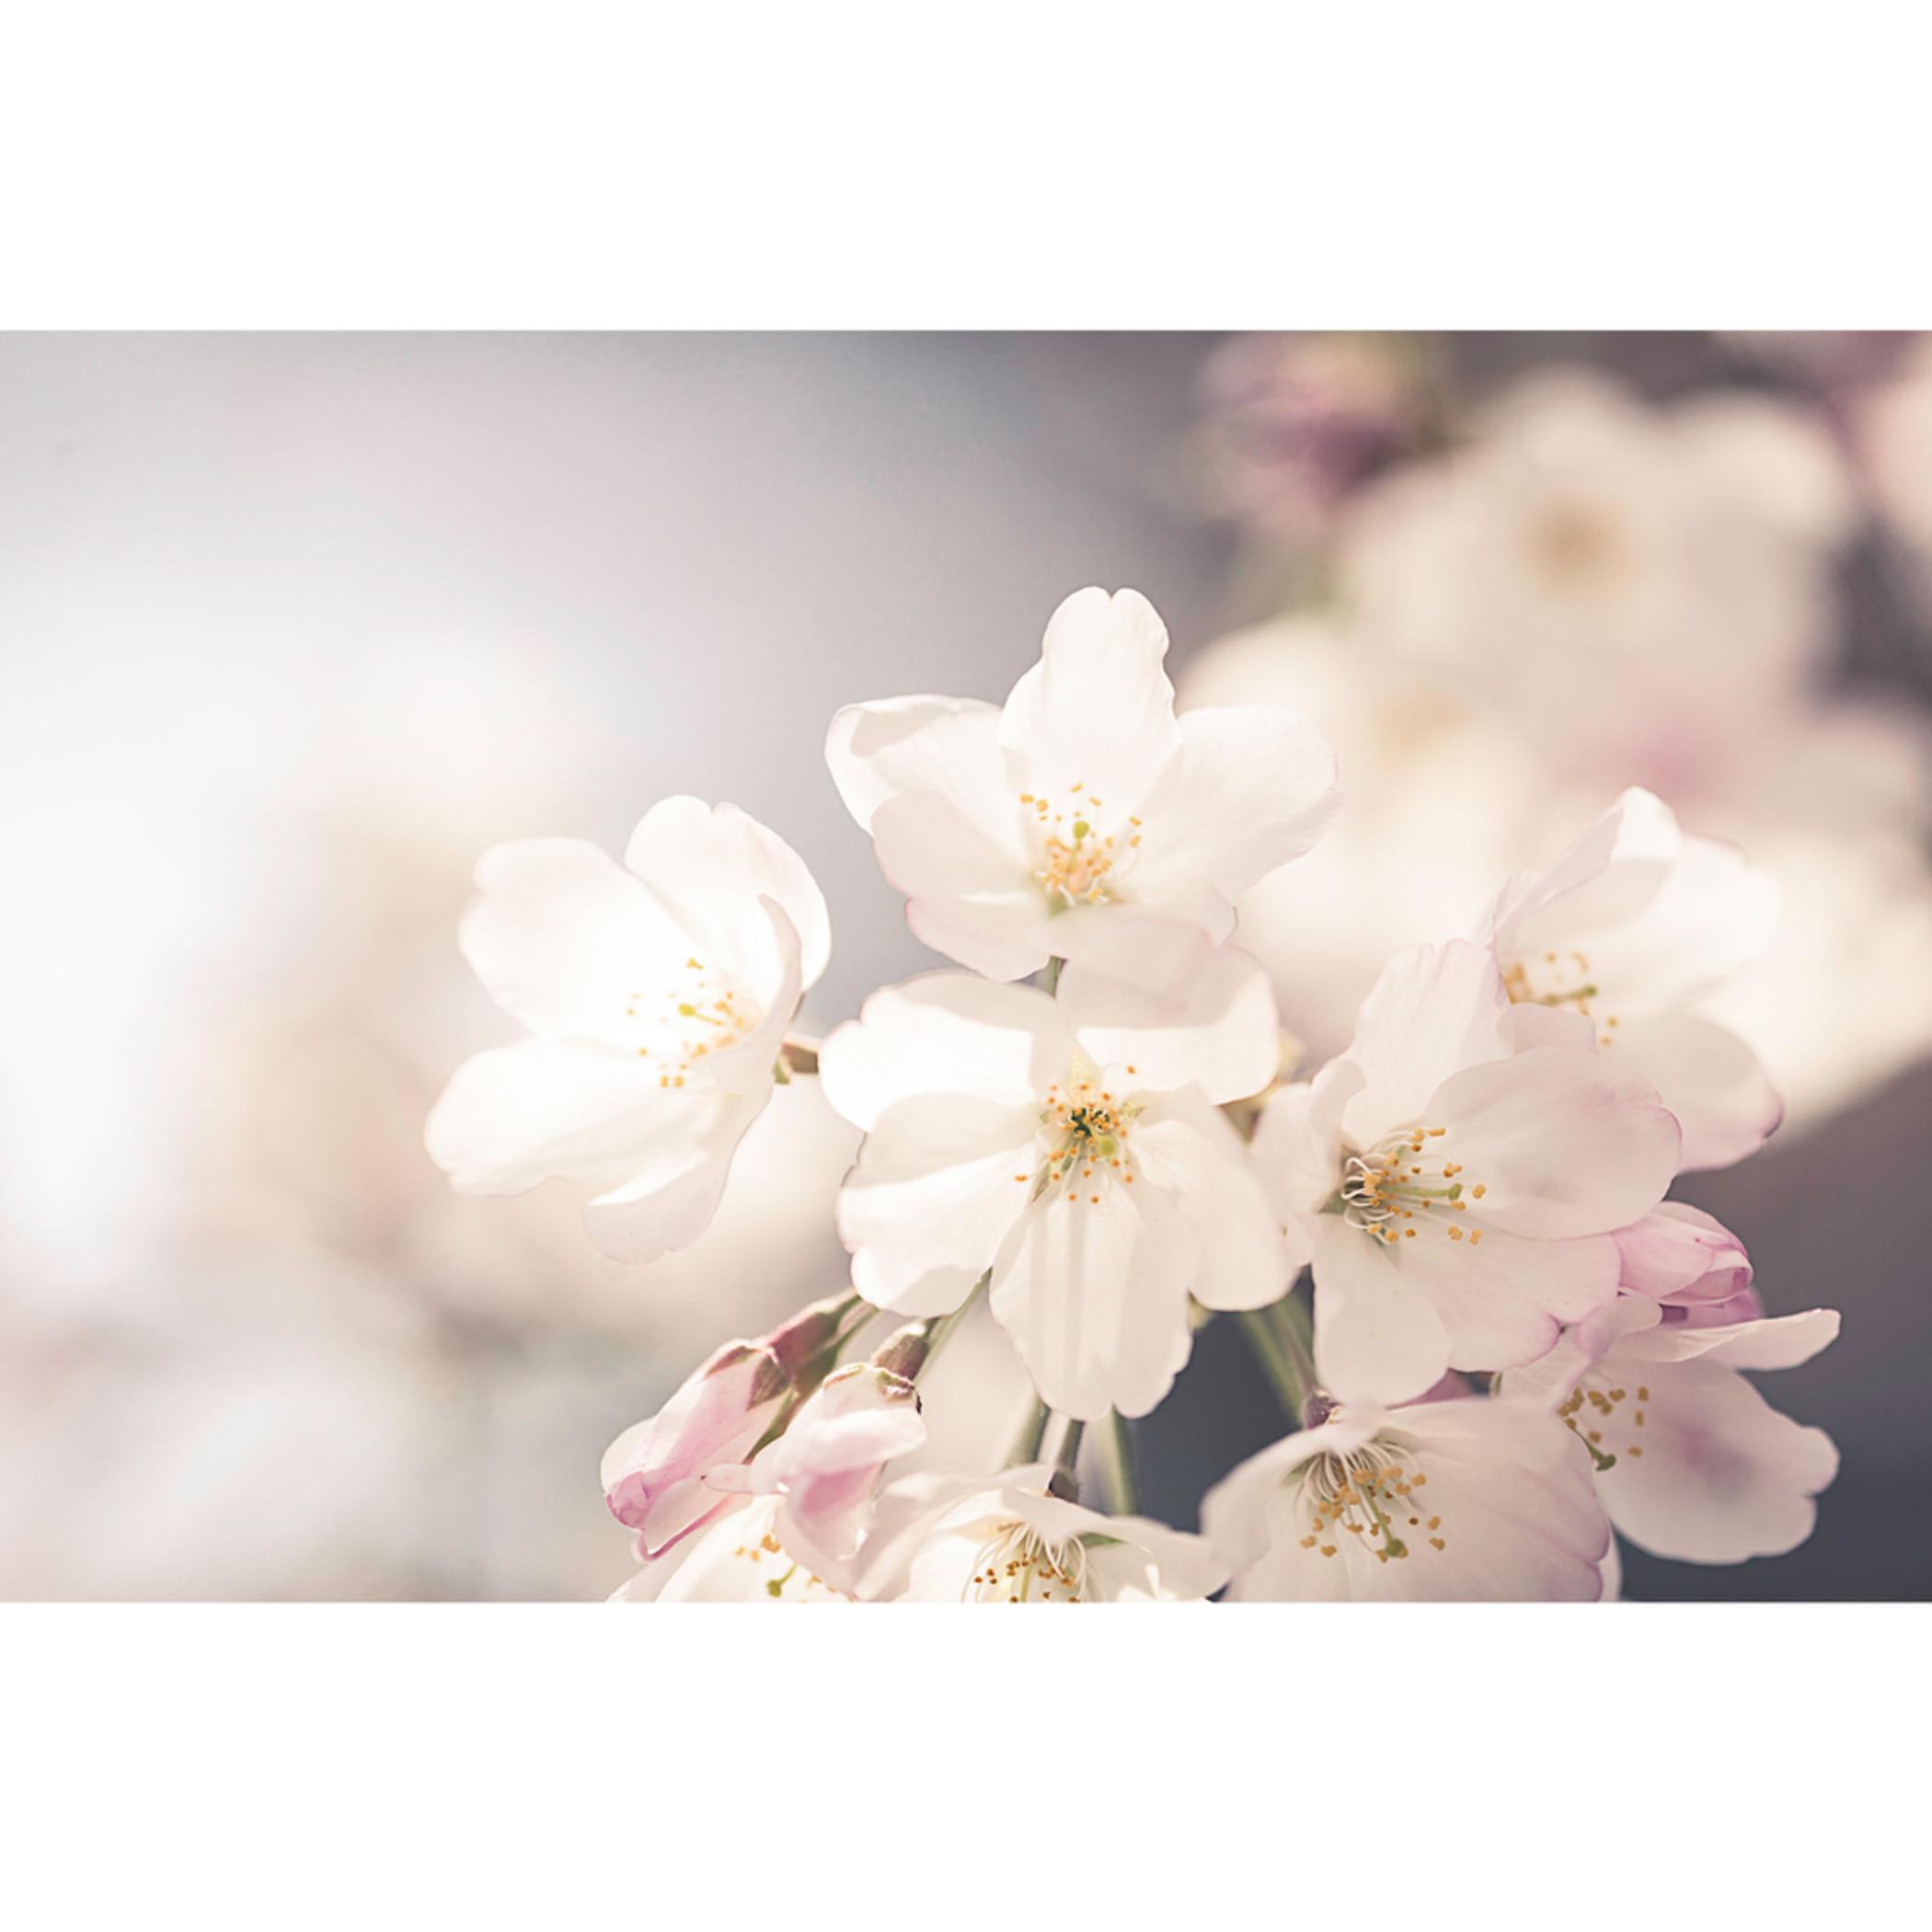 Cherry blossom tryptic e66lwr